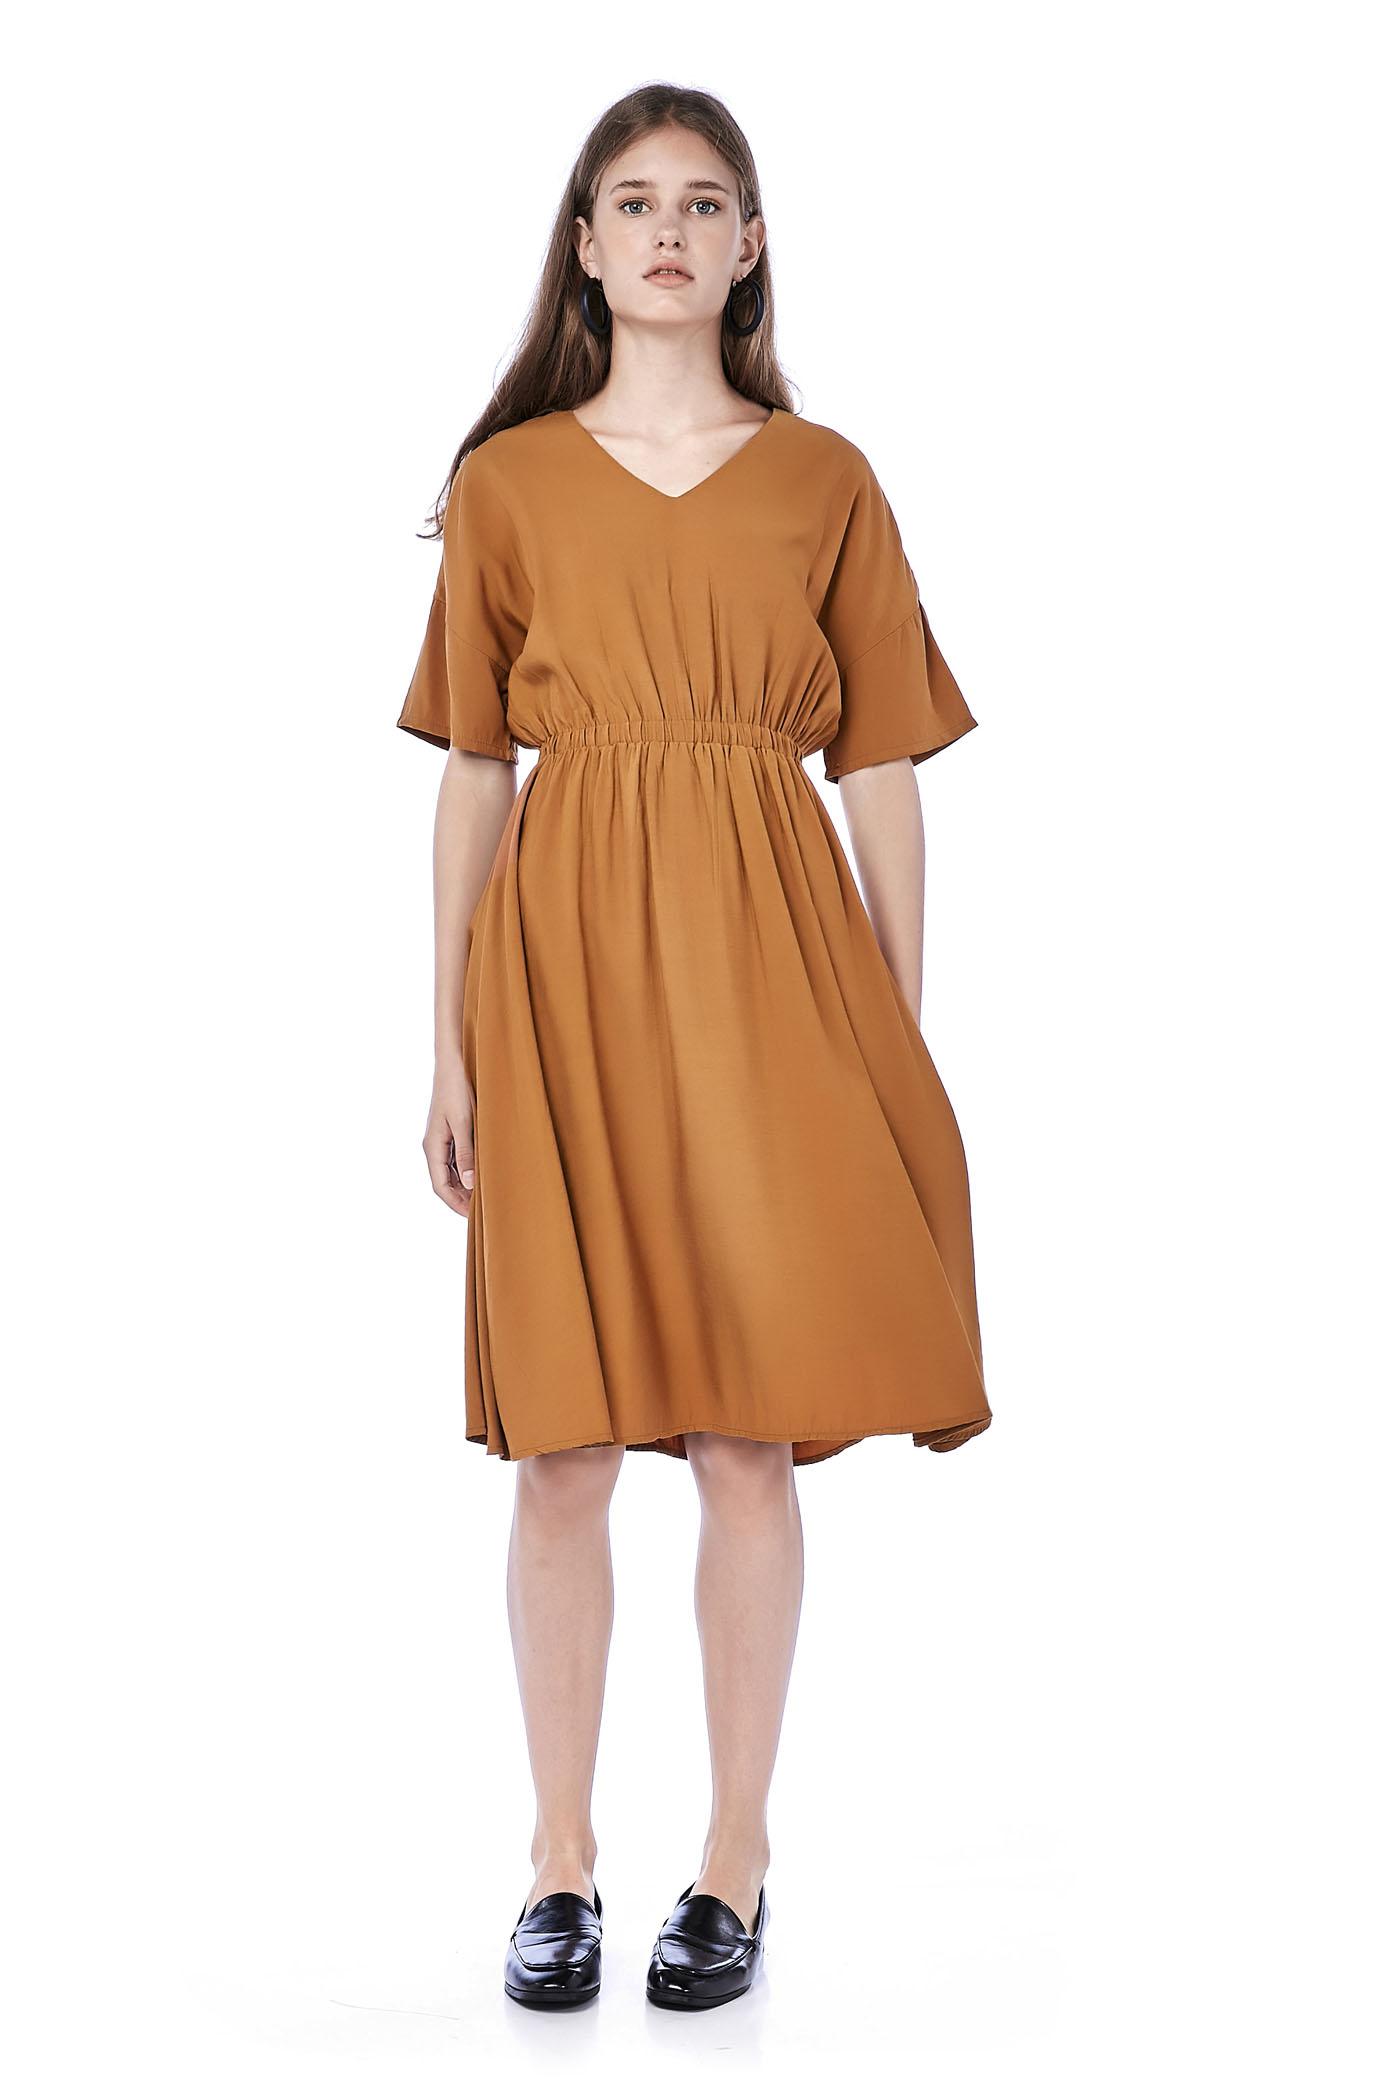 Monica Gathered-Waist Dress